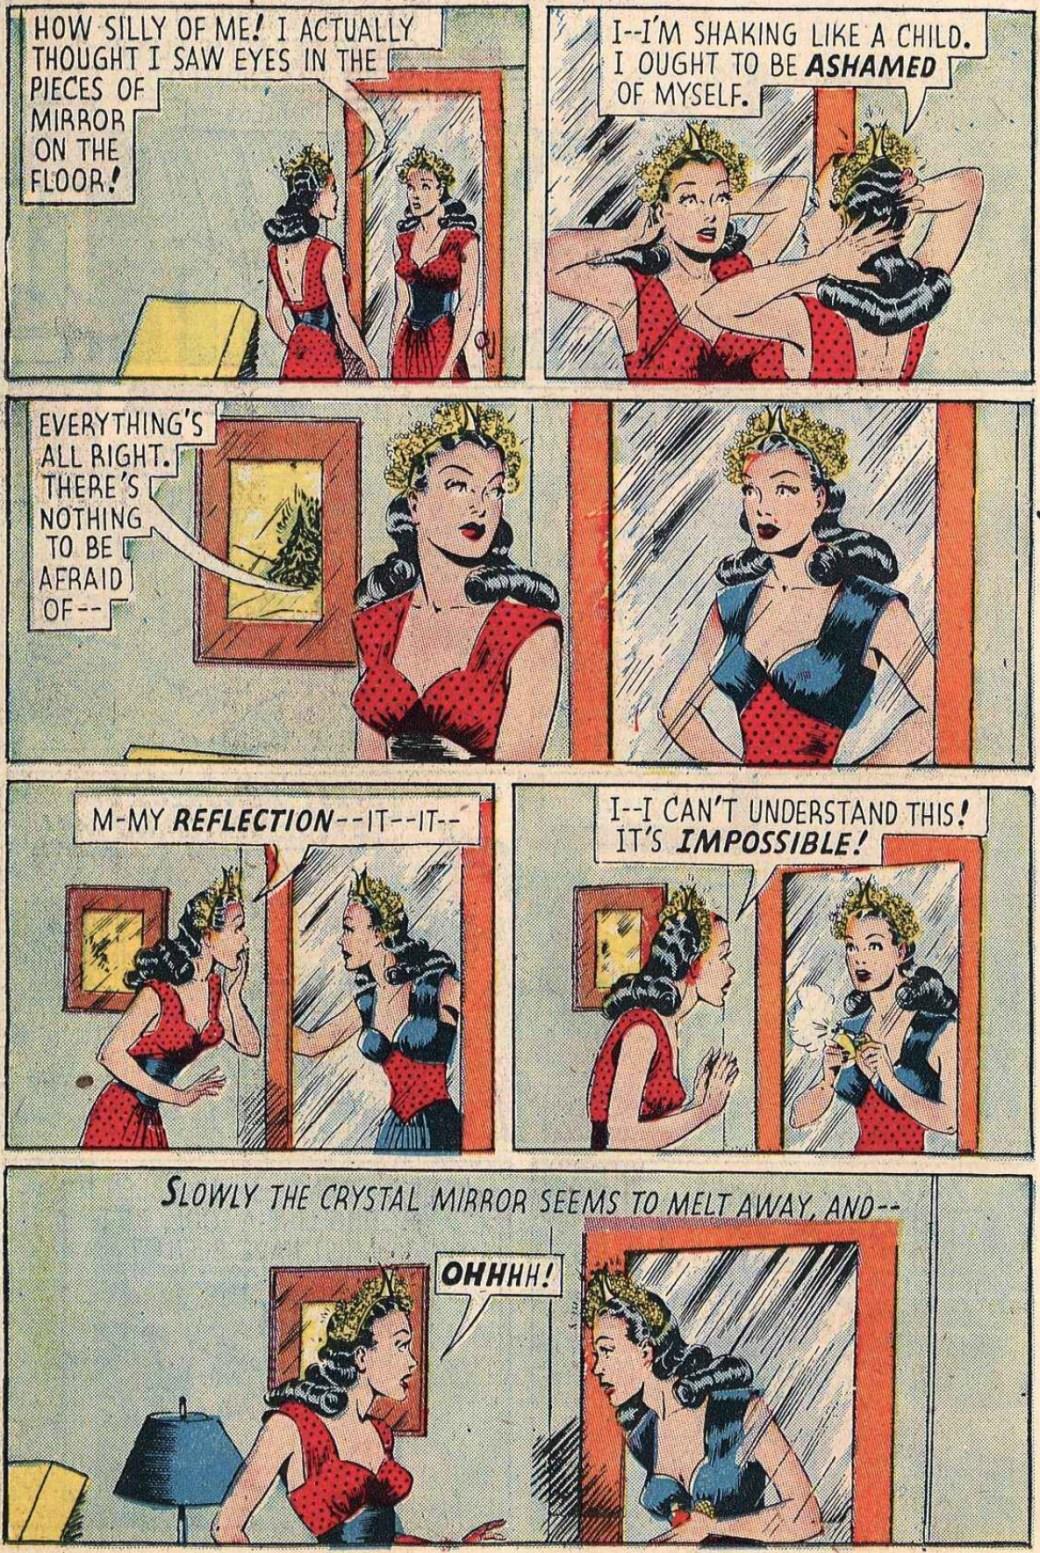 En sida ur en färgversion av The Mirror People